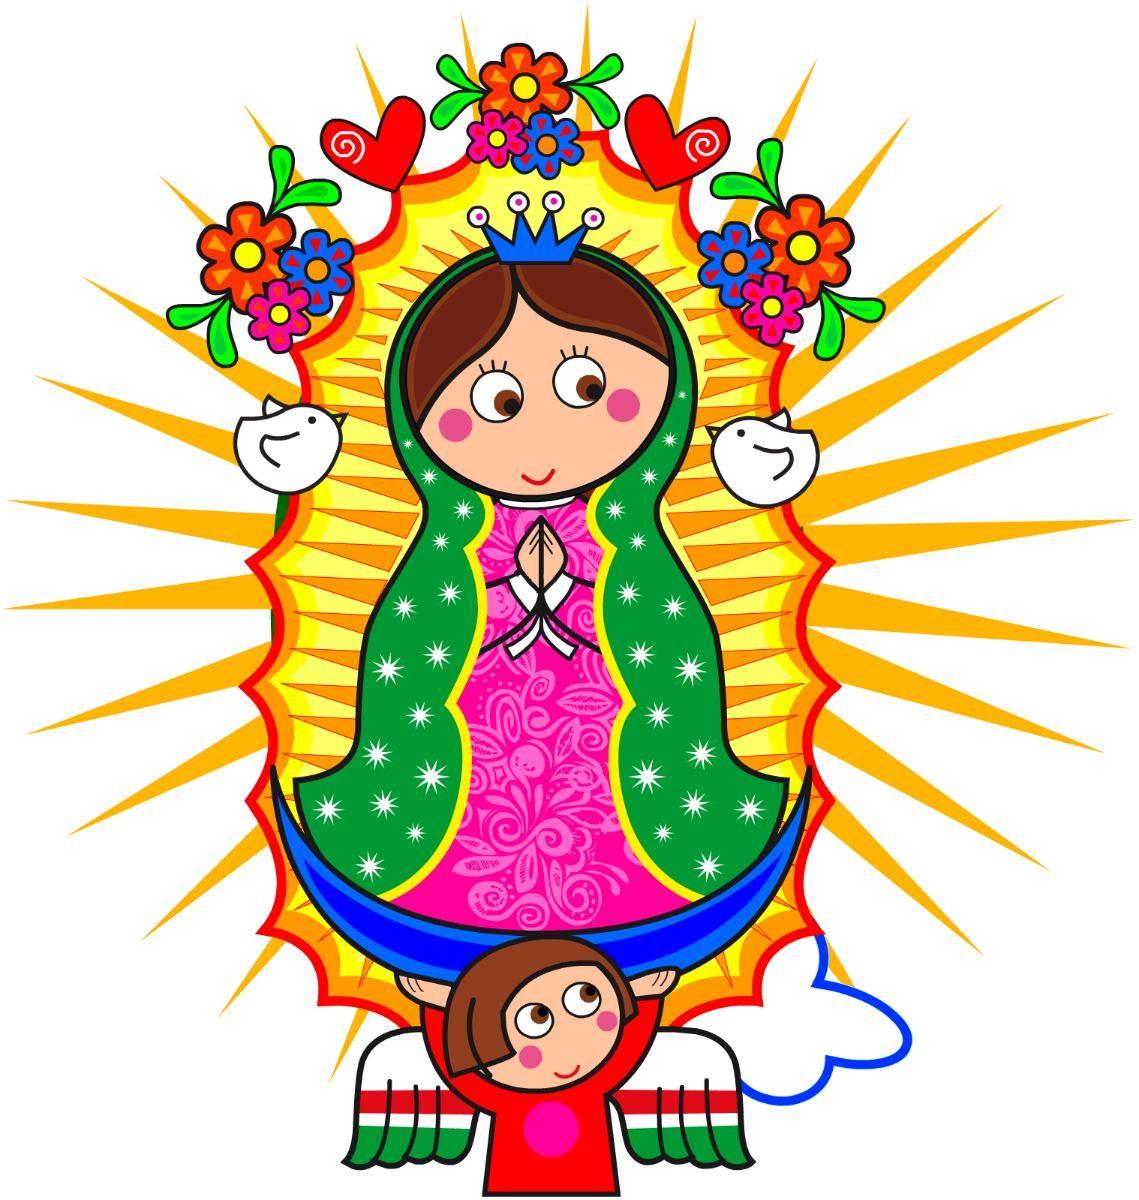 Decoracion Primera Comunion Virgen De Guadalupe ~ Virgencita plis distroller wallpaper  Imagui